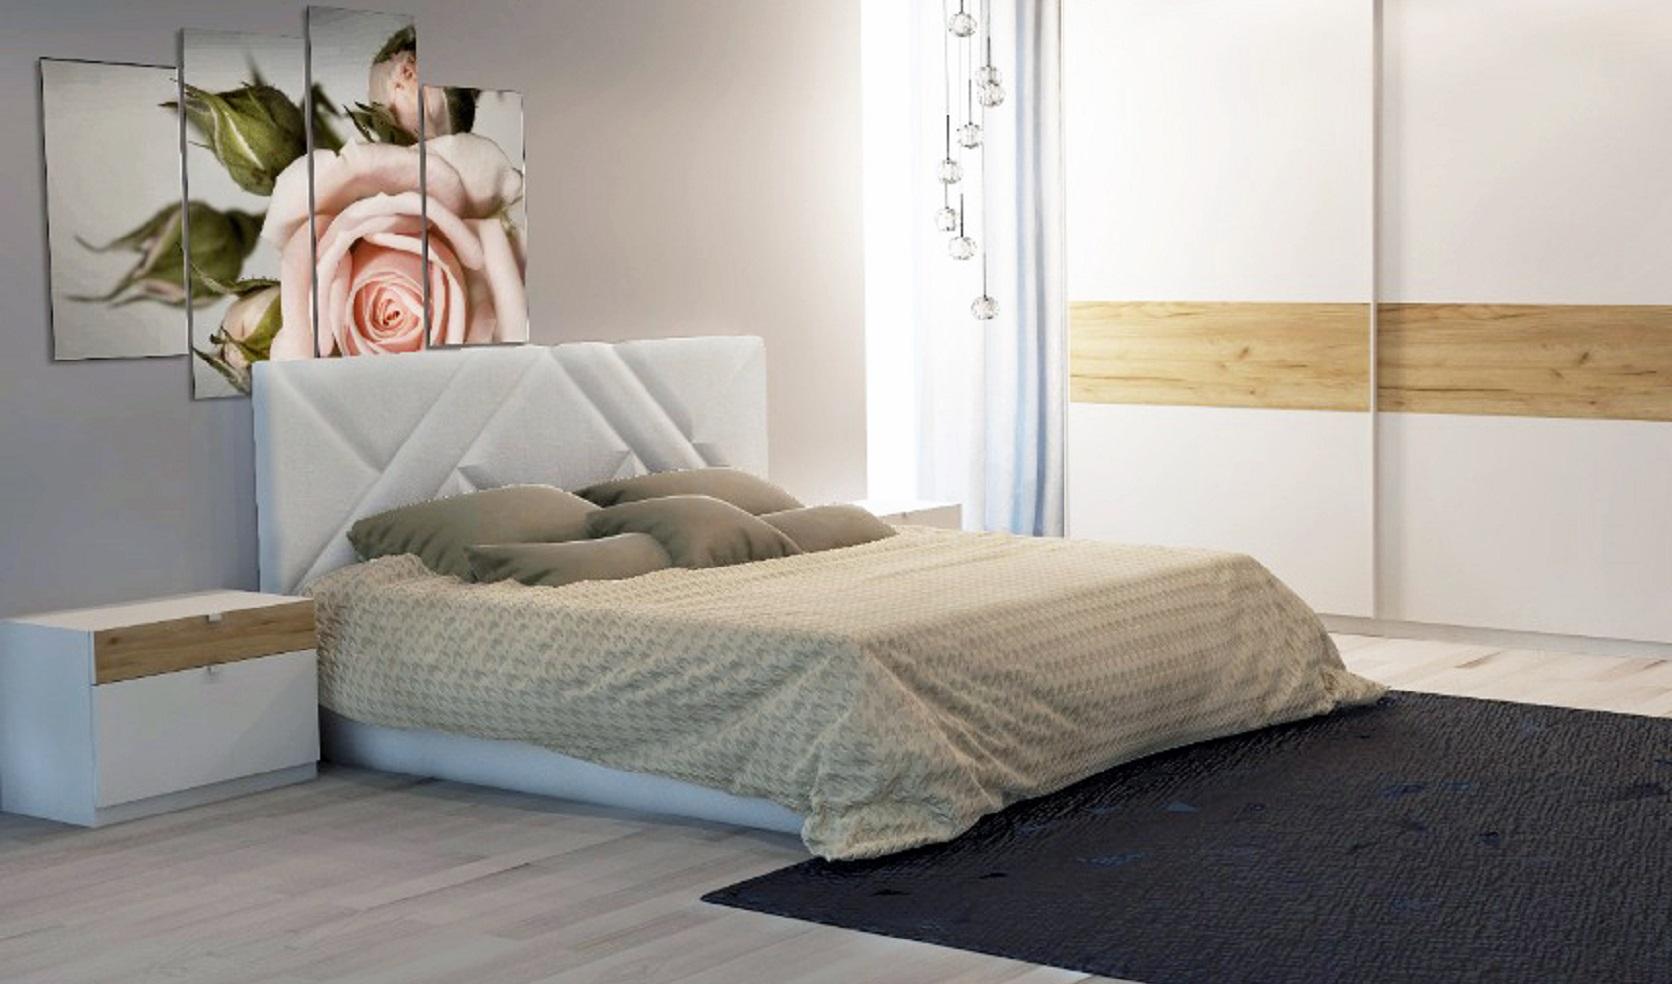 Full Size of Bett Modern Design Italienisches Puristisch Modernes Jugend Japanische Betten Weißes 140x200 Himmel Designer Badezimmer Wickelbrett Für Teenager Kaufen Sofa Bett Bett Modern Design